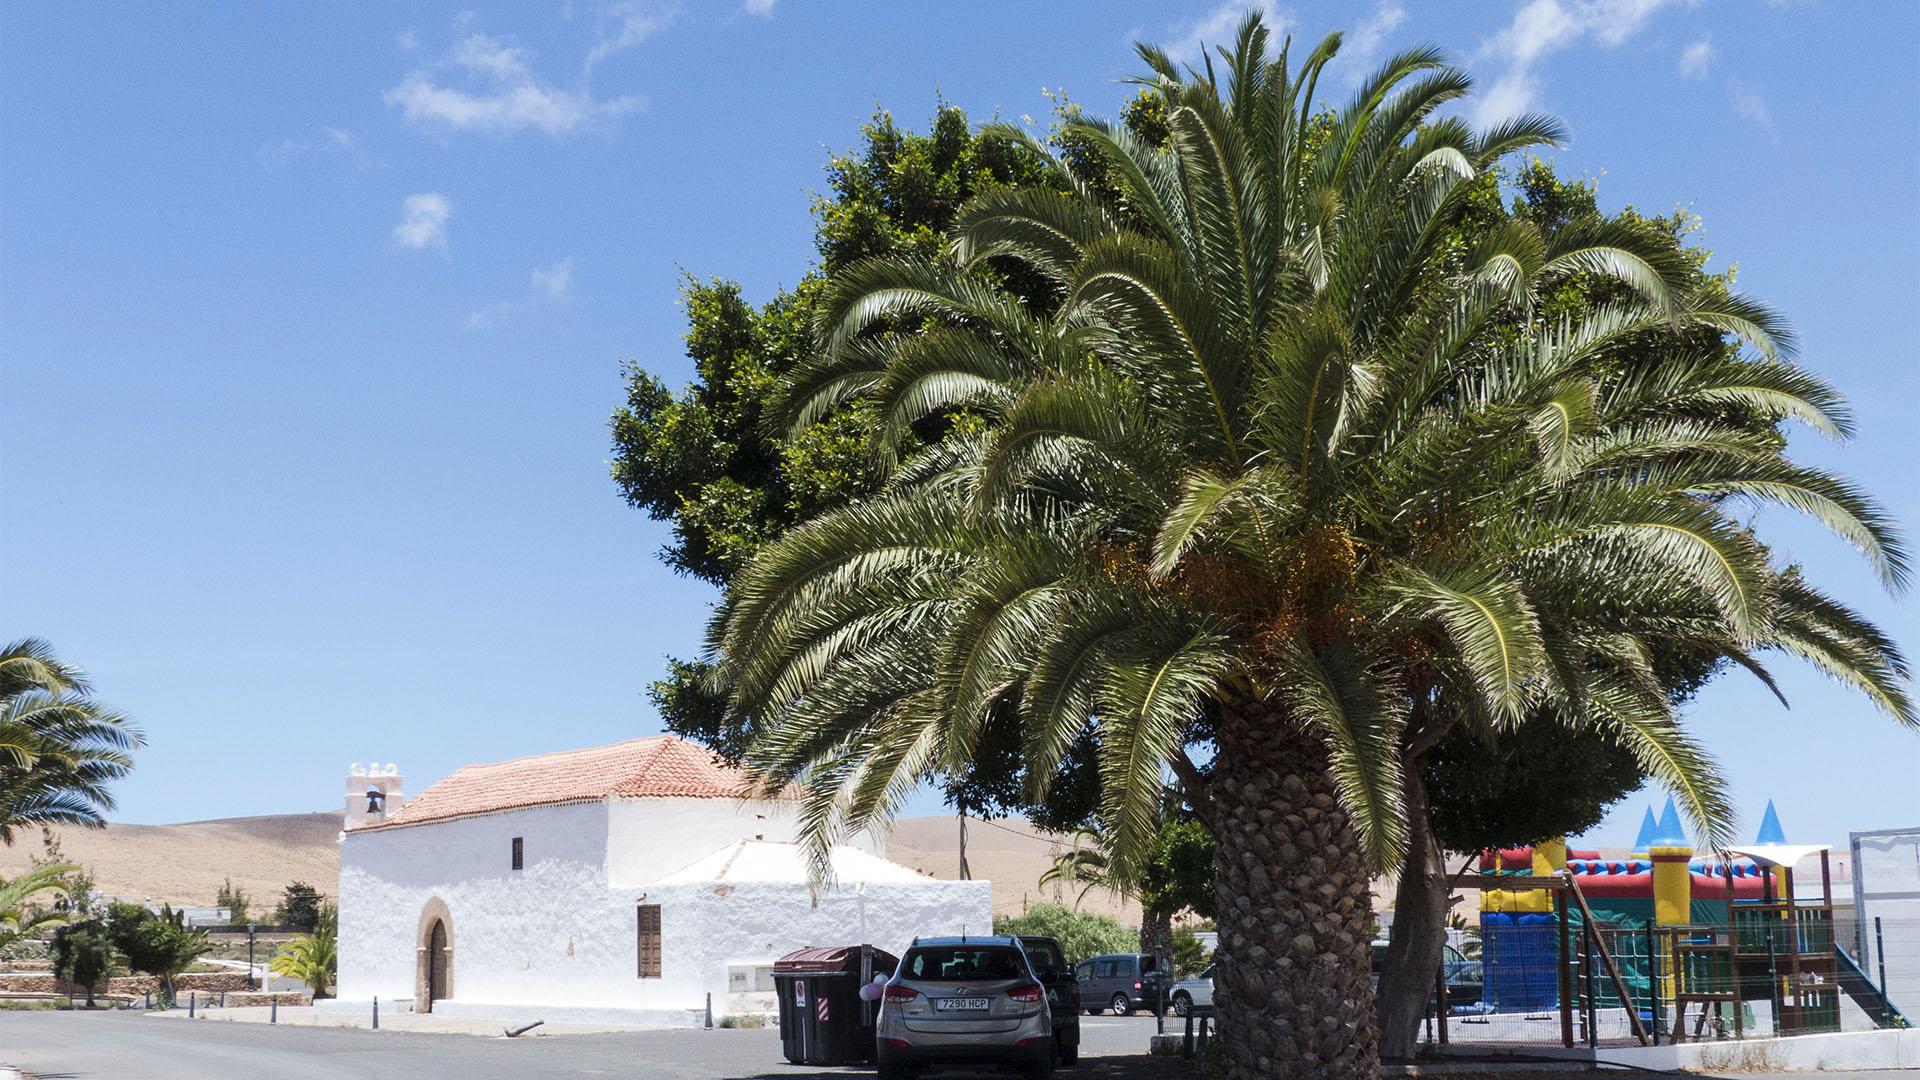 Städte und Ortschaften Fuerteventuras: Llanos de la Concepcion